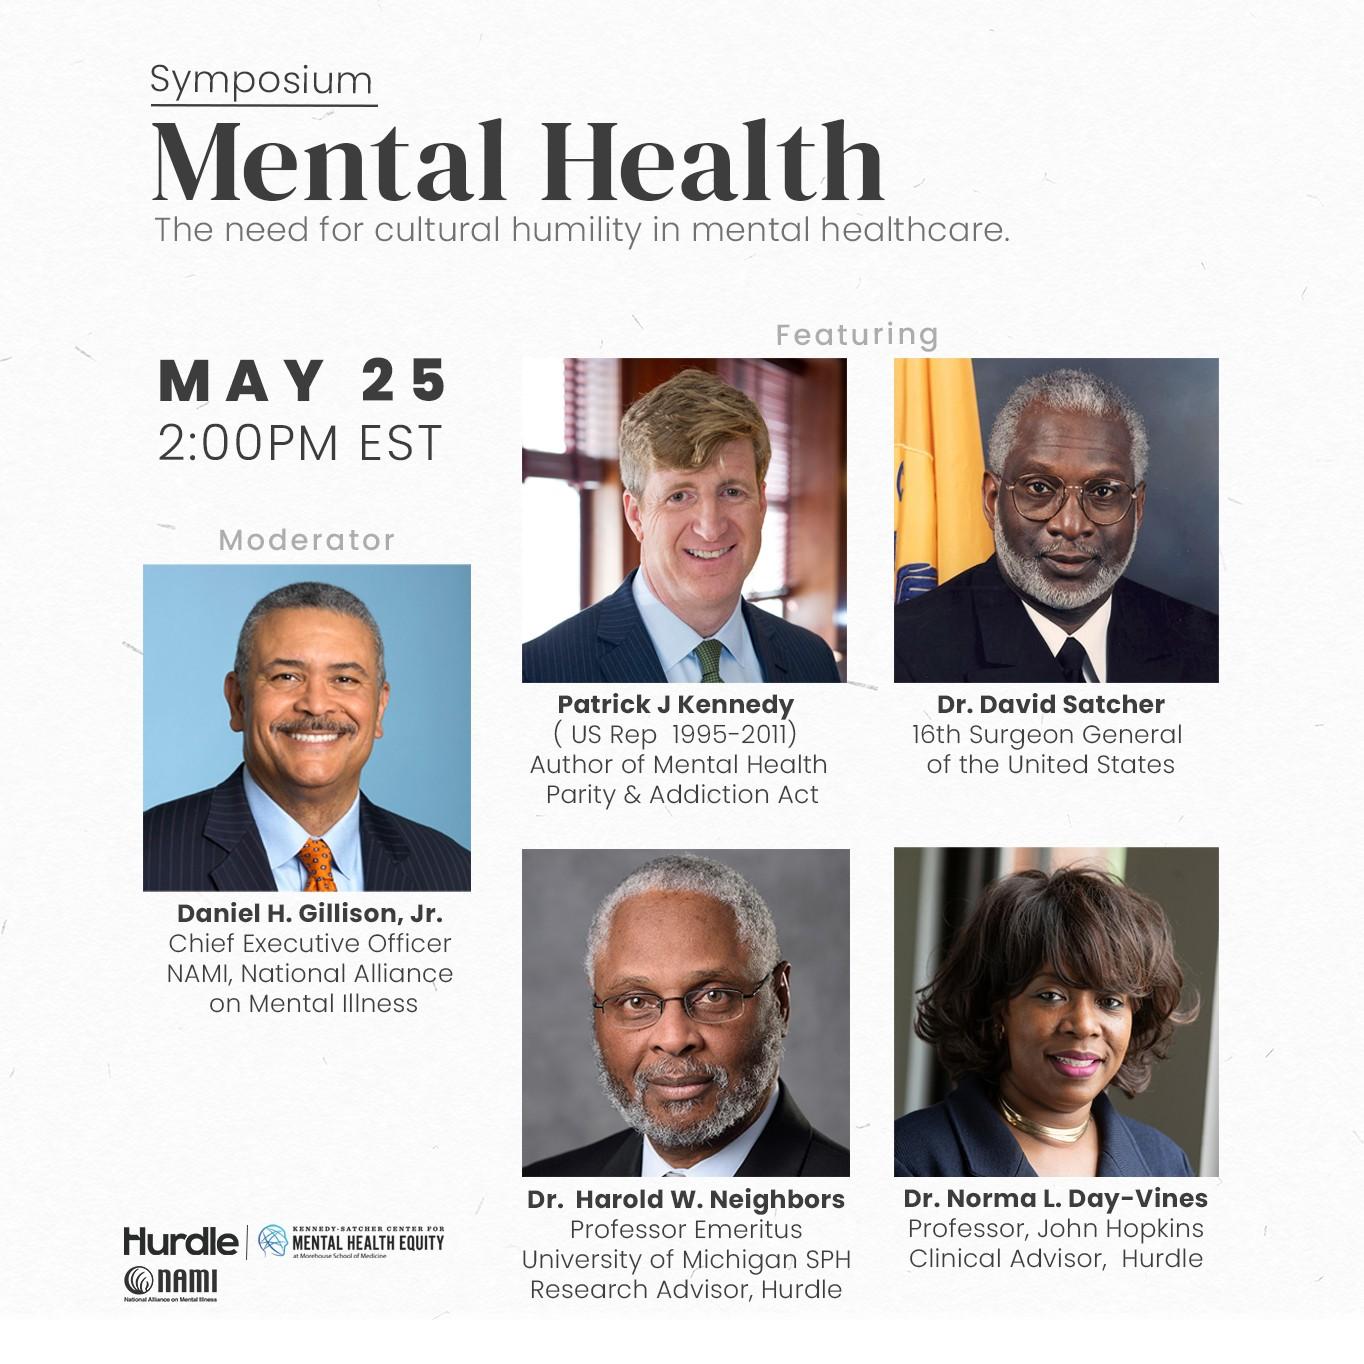 black mental health symposium poster